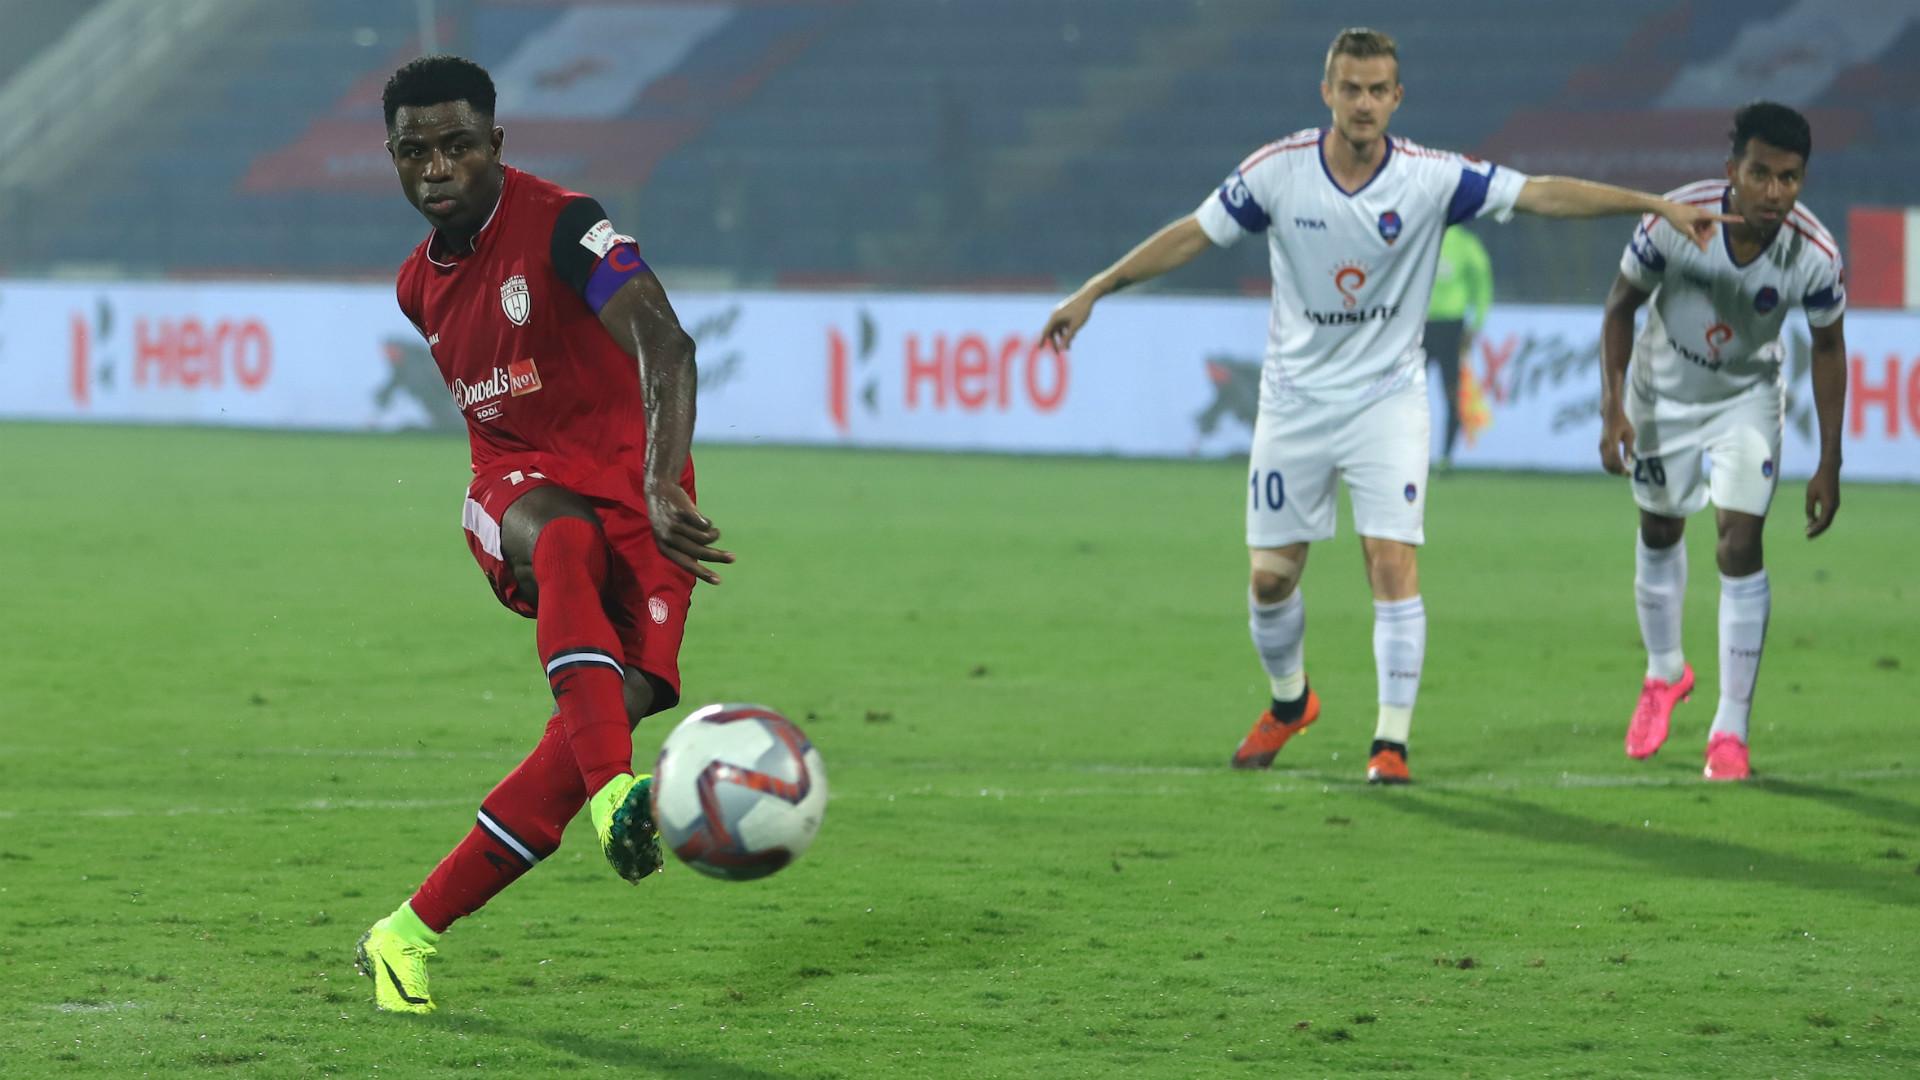 Bartholomew Ogbeche NorthEast United Delhi Dynamos ISL 5